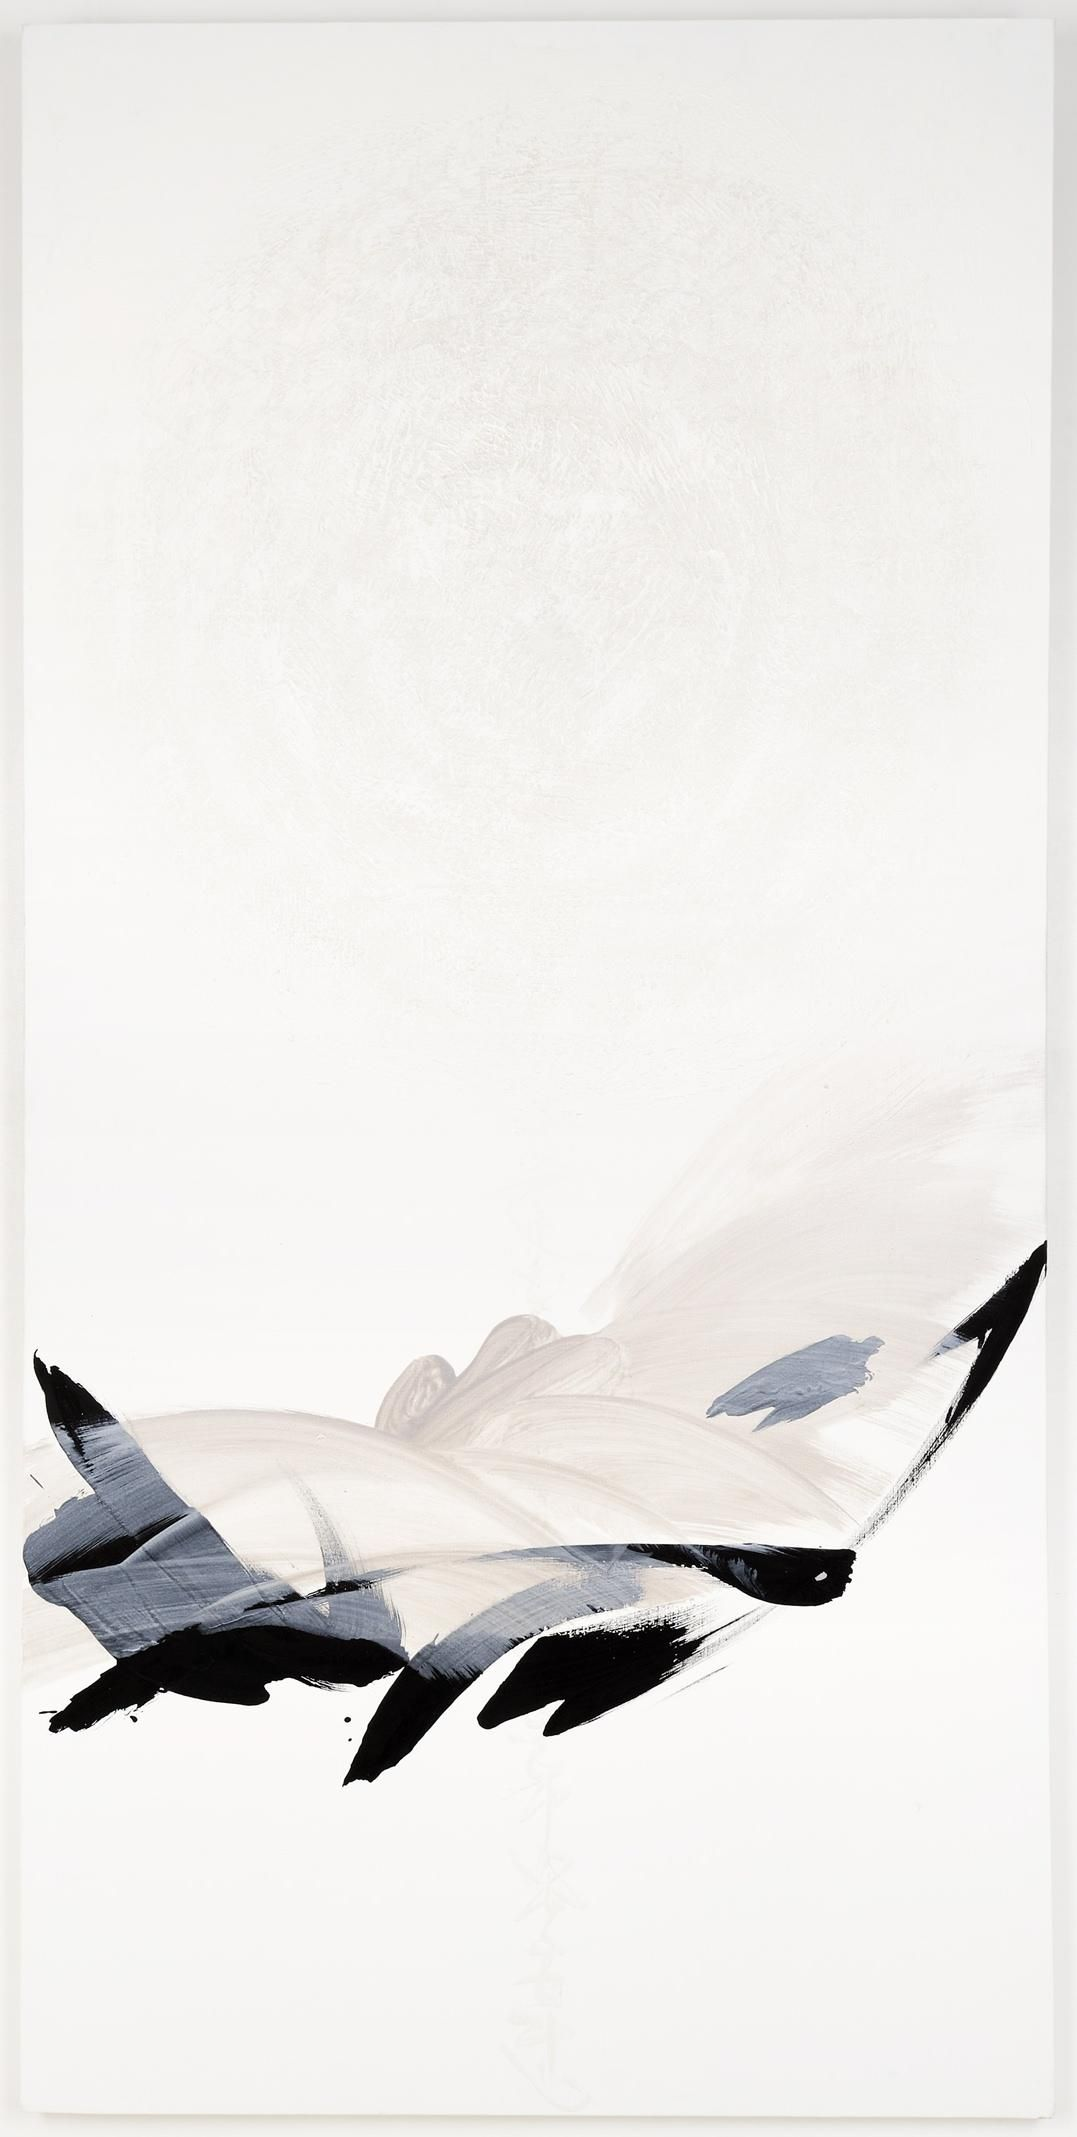 Hachiro Kanno | N 544 | Ink and acrylic on paper | http://www.artistics.com/en/art/hachiro_kanno/tn-544